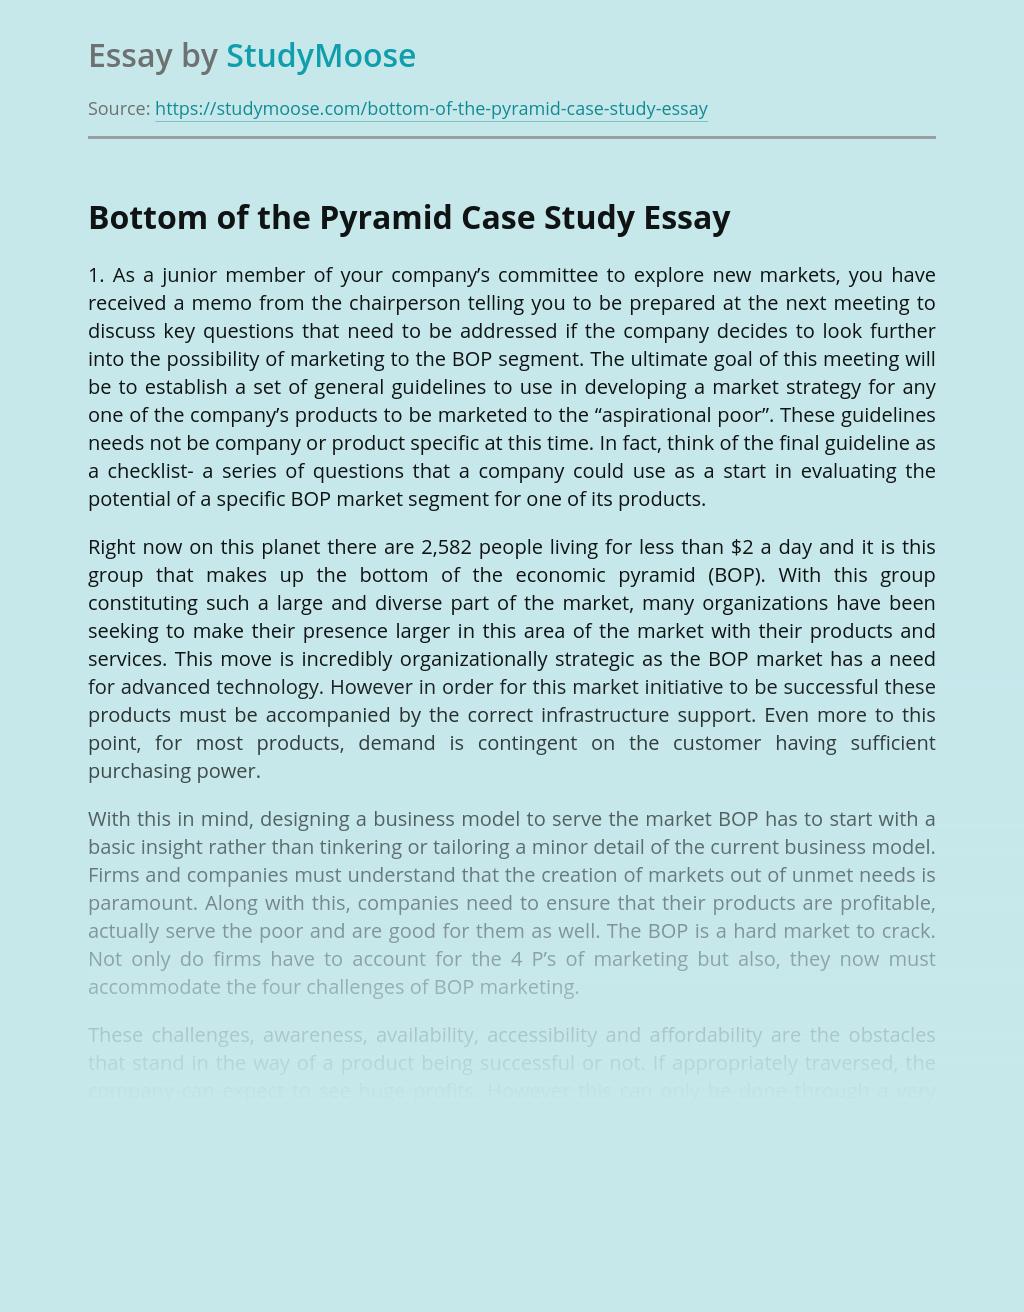 Bottom of the Pyramid Case Study